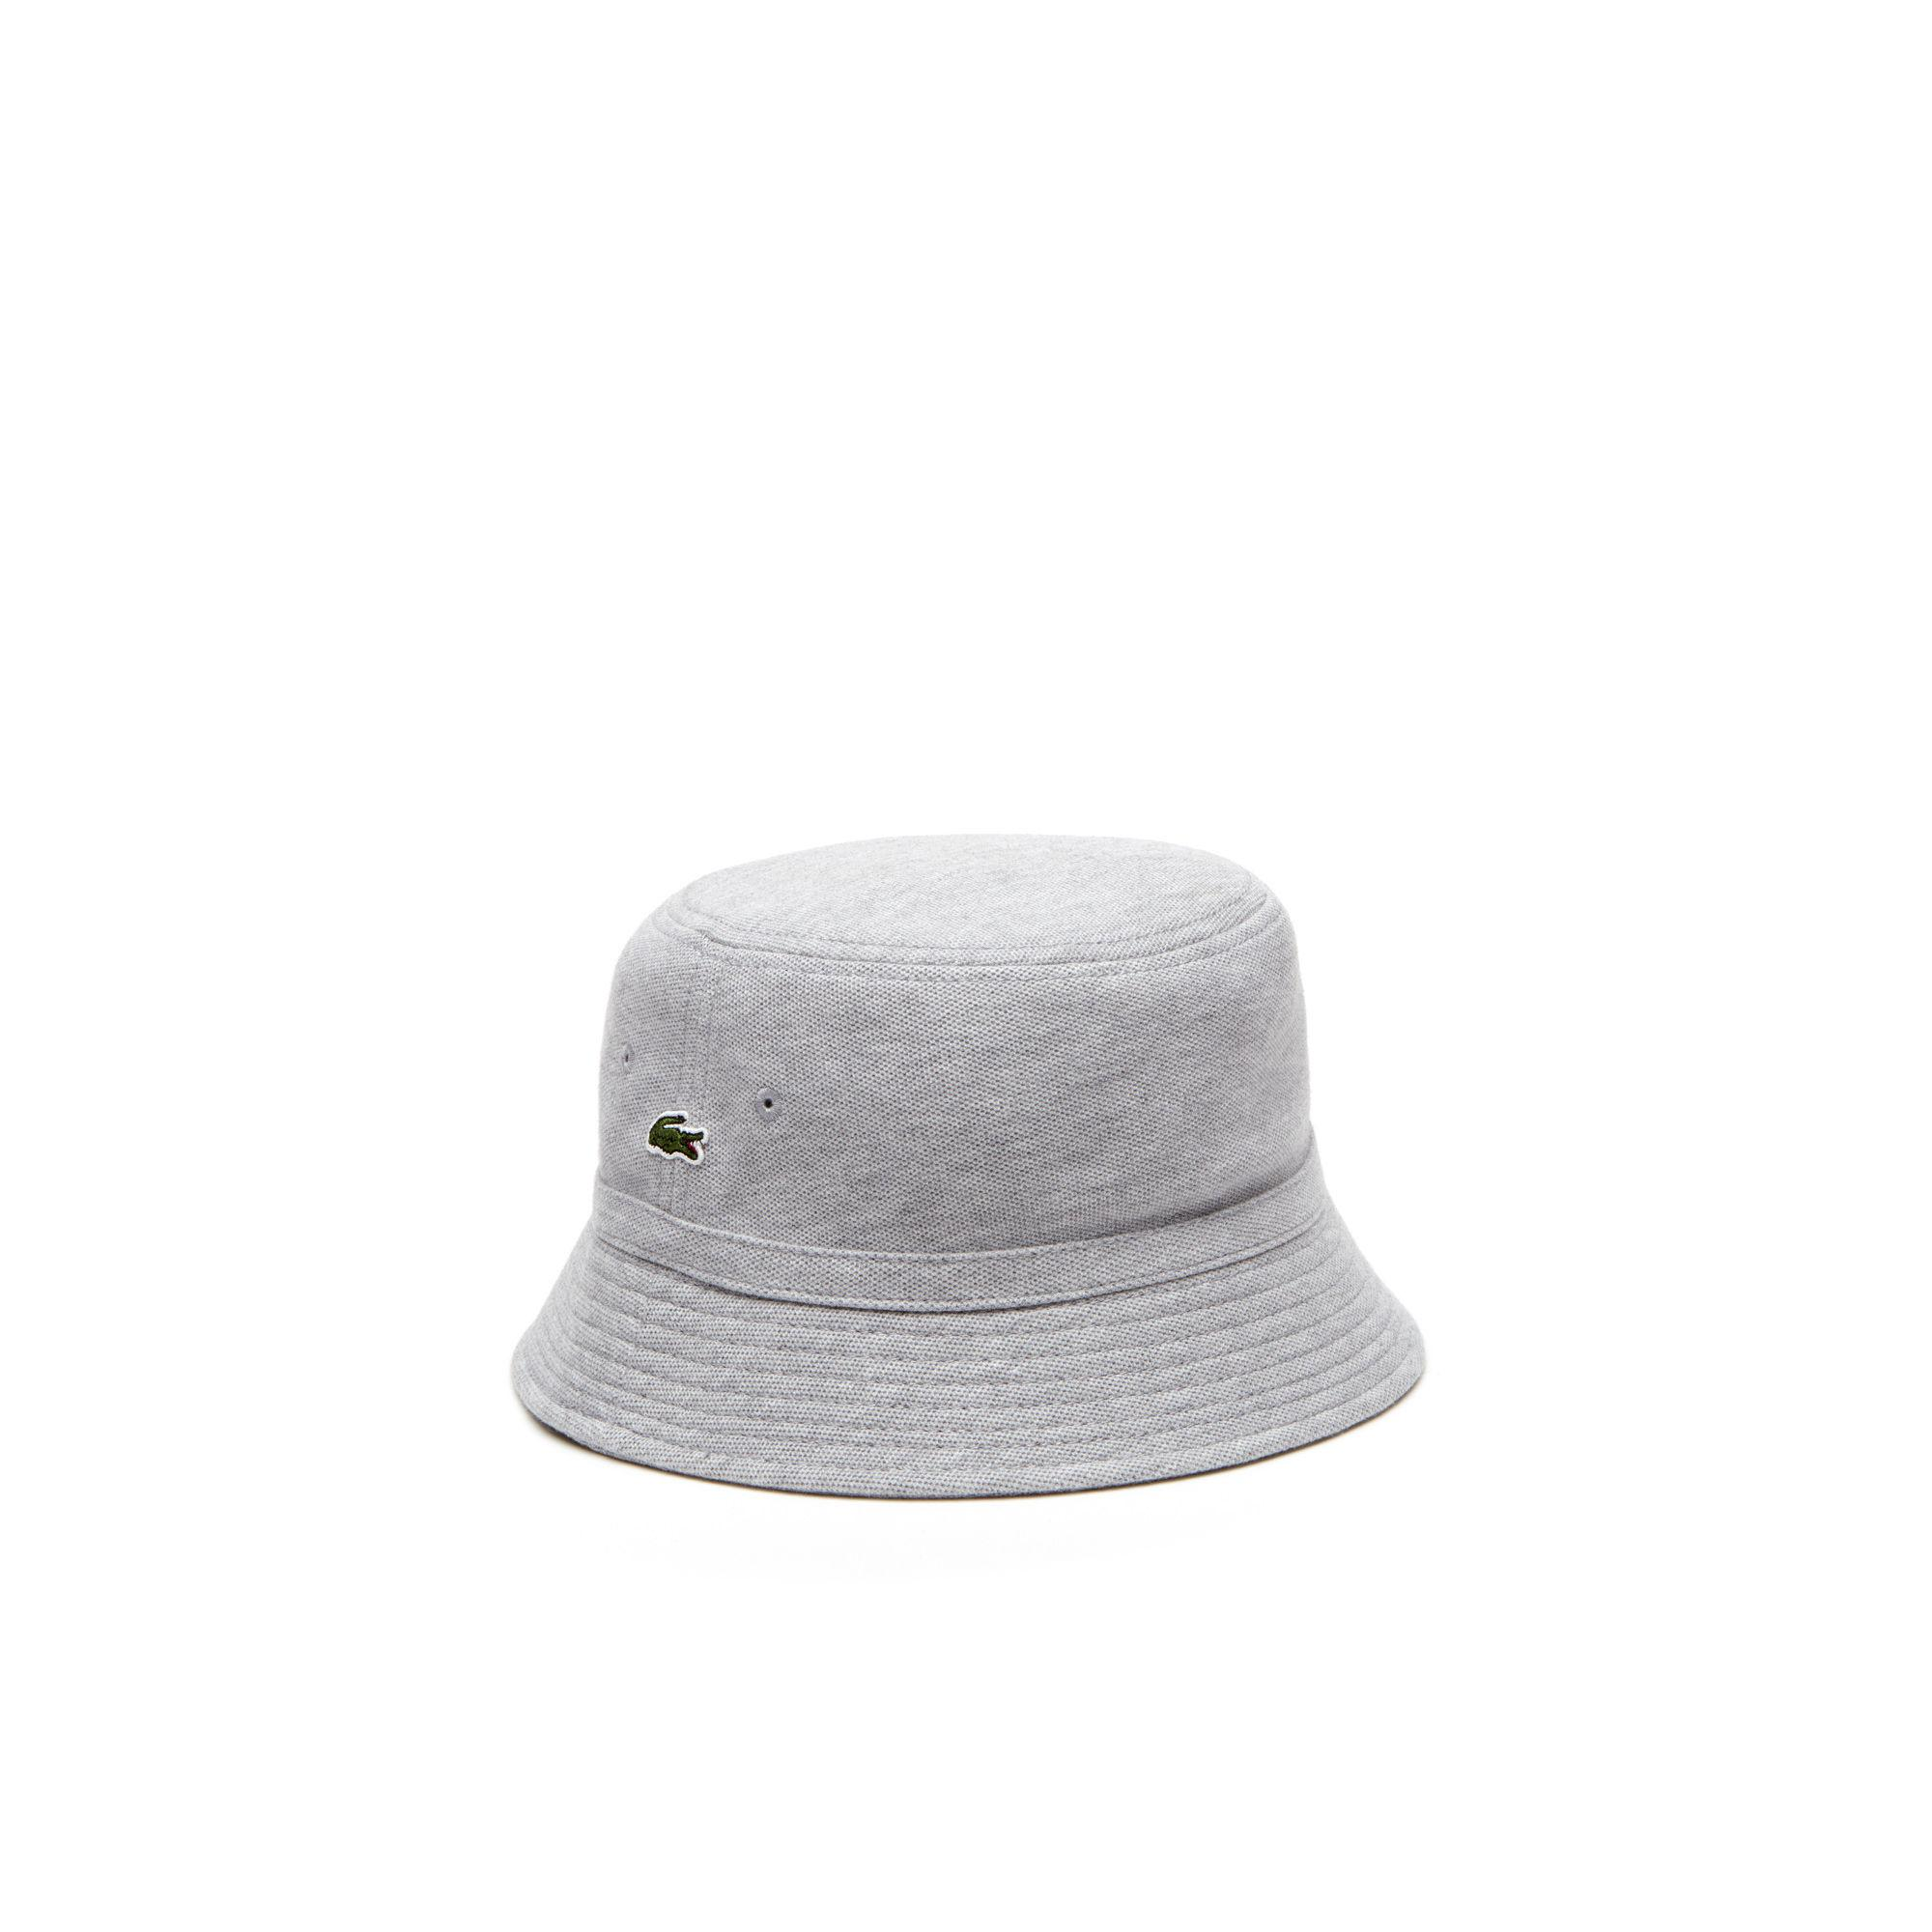 566466150c4d Lacoste Cotton Piqué Bucket Hat in Gray for Men - Lyst